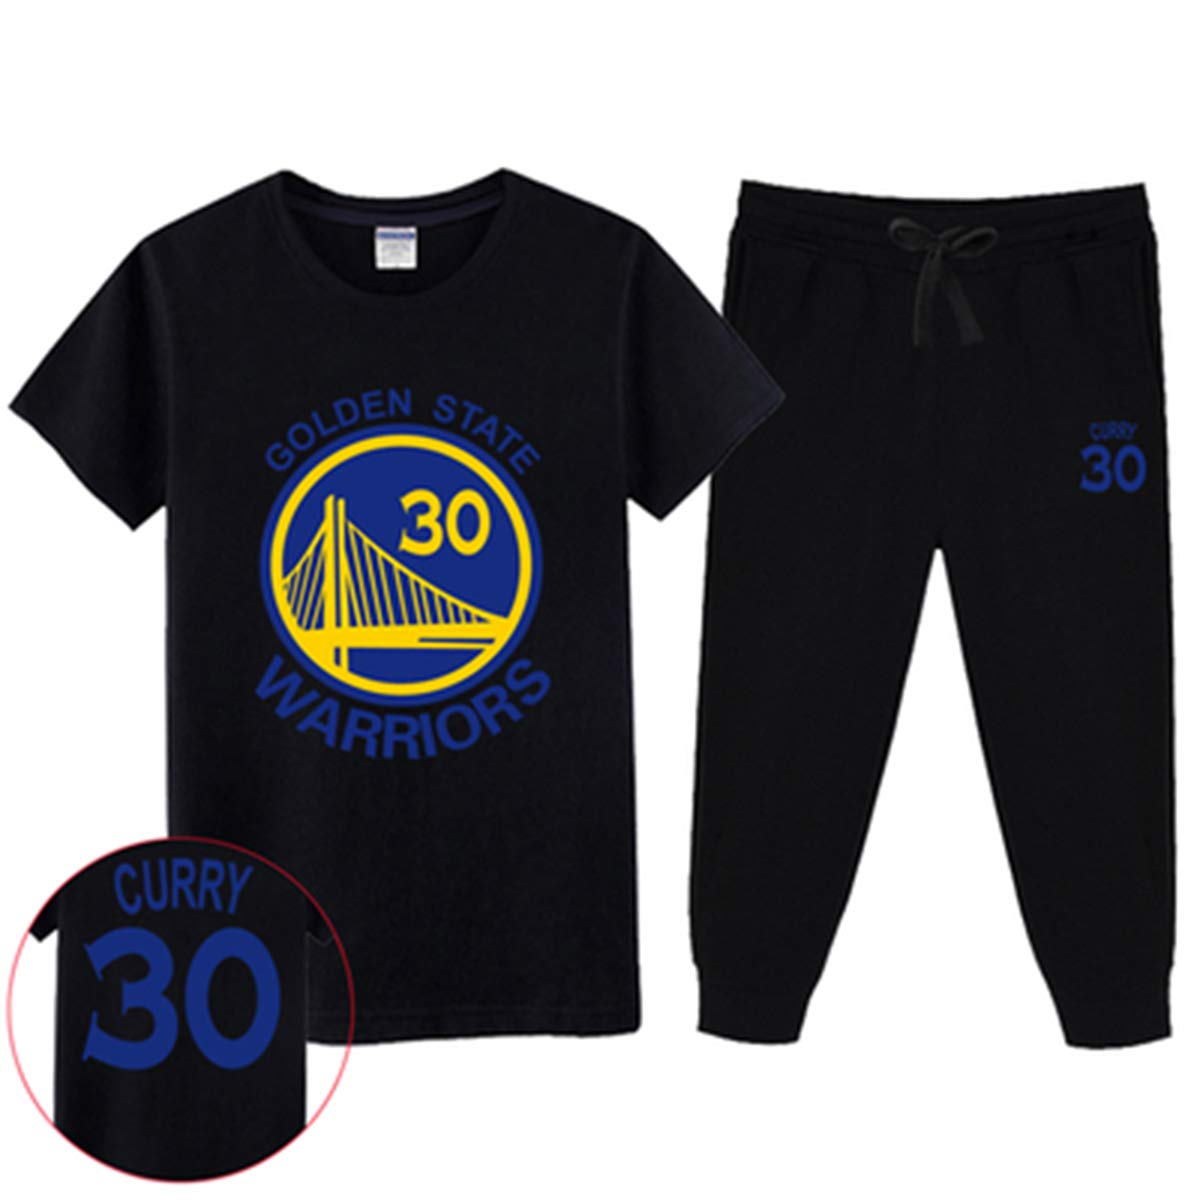 T-SHIRT Conjunto De Camiseta De Fan De La NBA Camiseta De ...